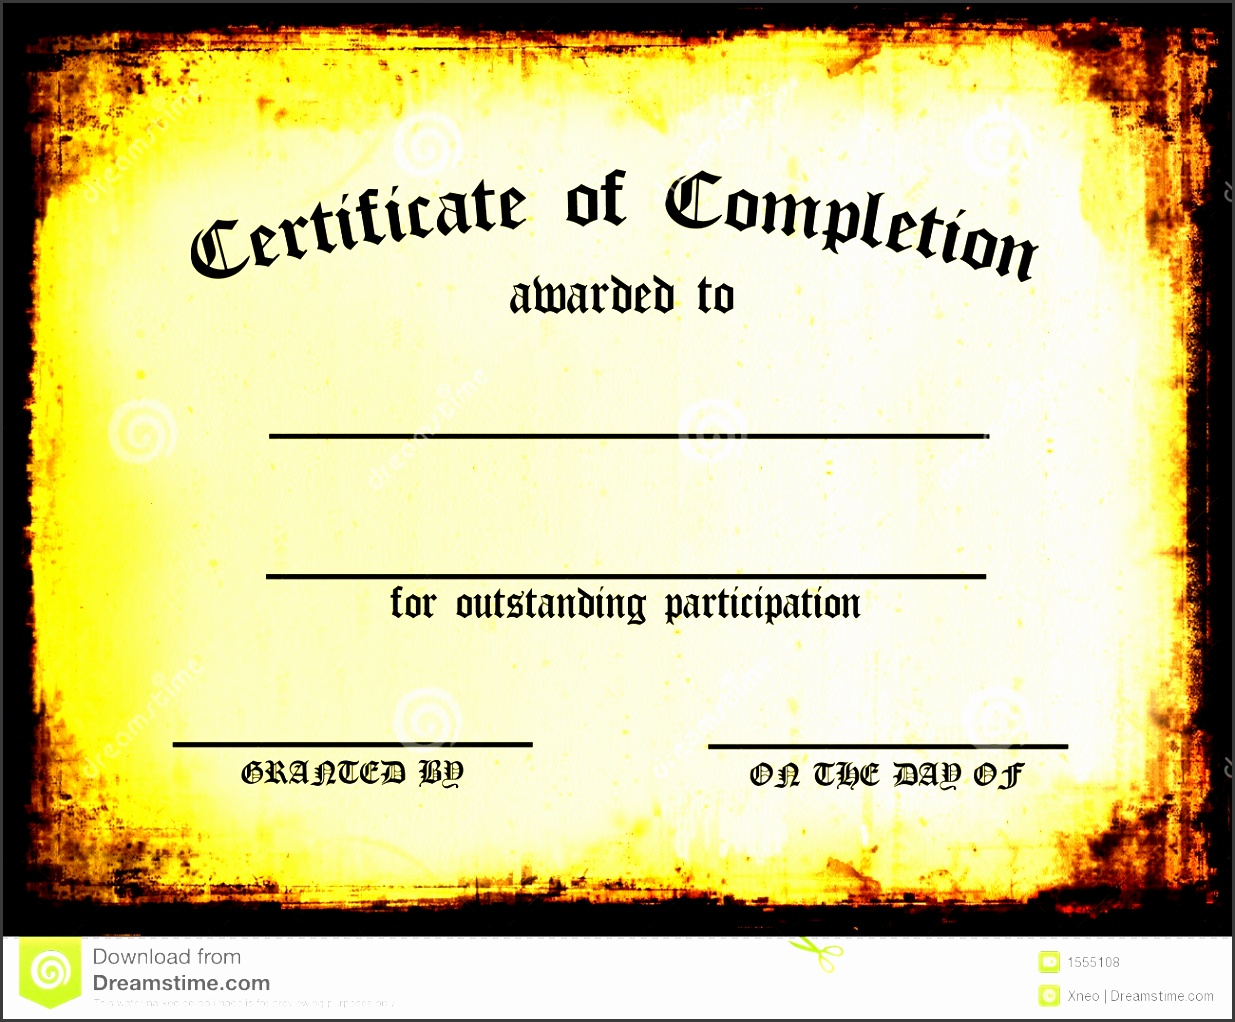 10 Sample Certificate Of Completion - SampleTemplatess ...